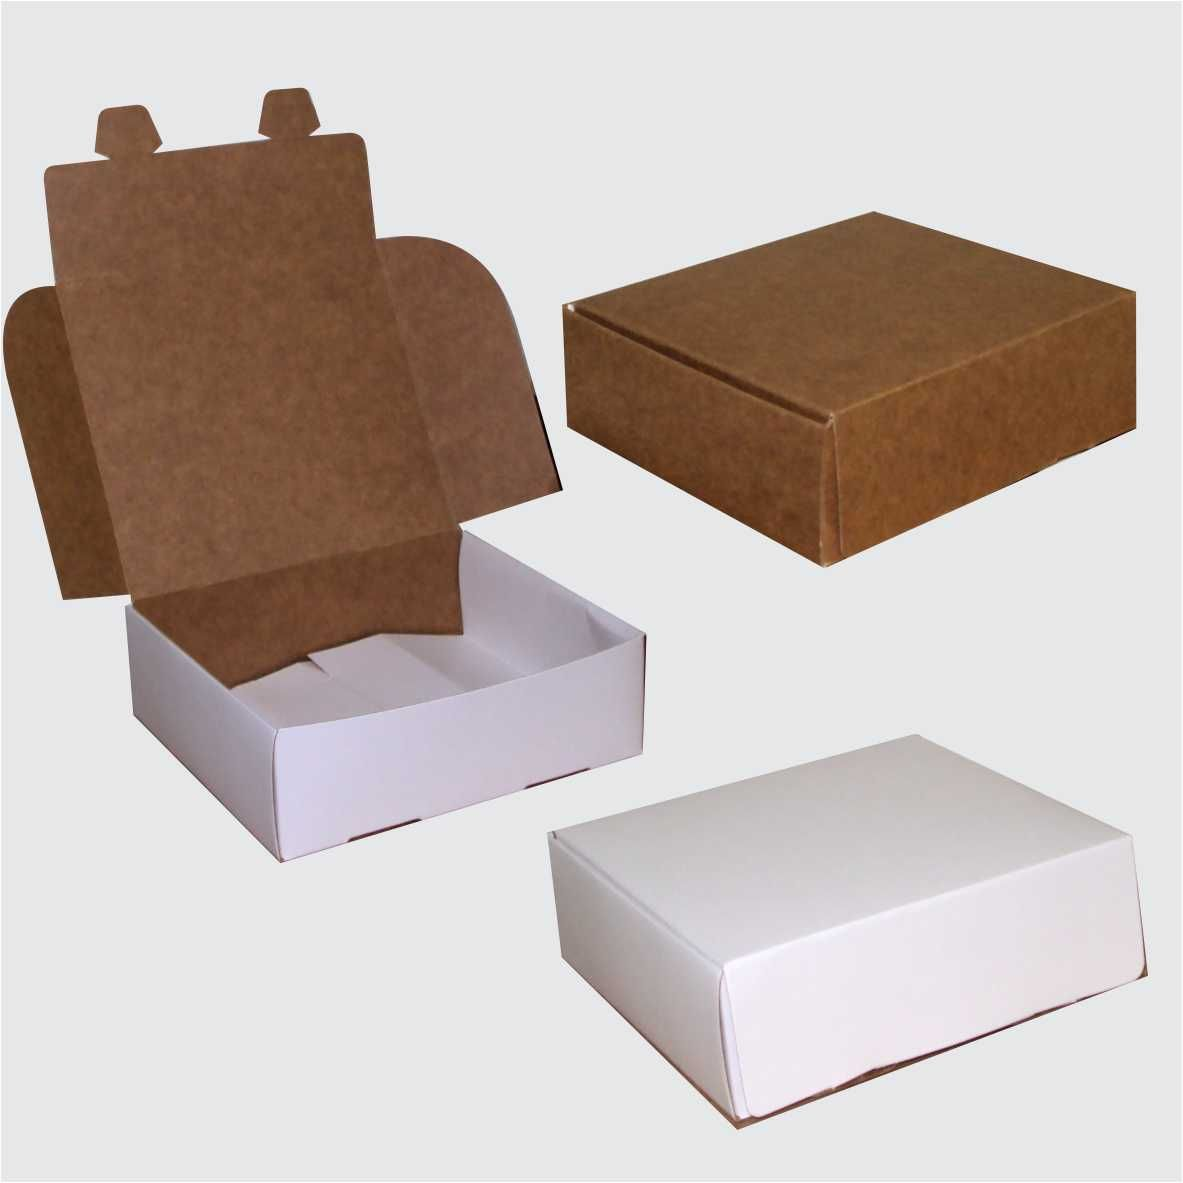 Caixa de papel pequena  branca ou kraft (10,5x9,5x3,5 cm) - 10 unidades